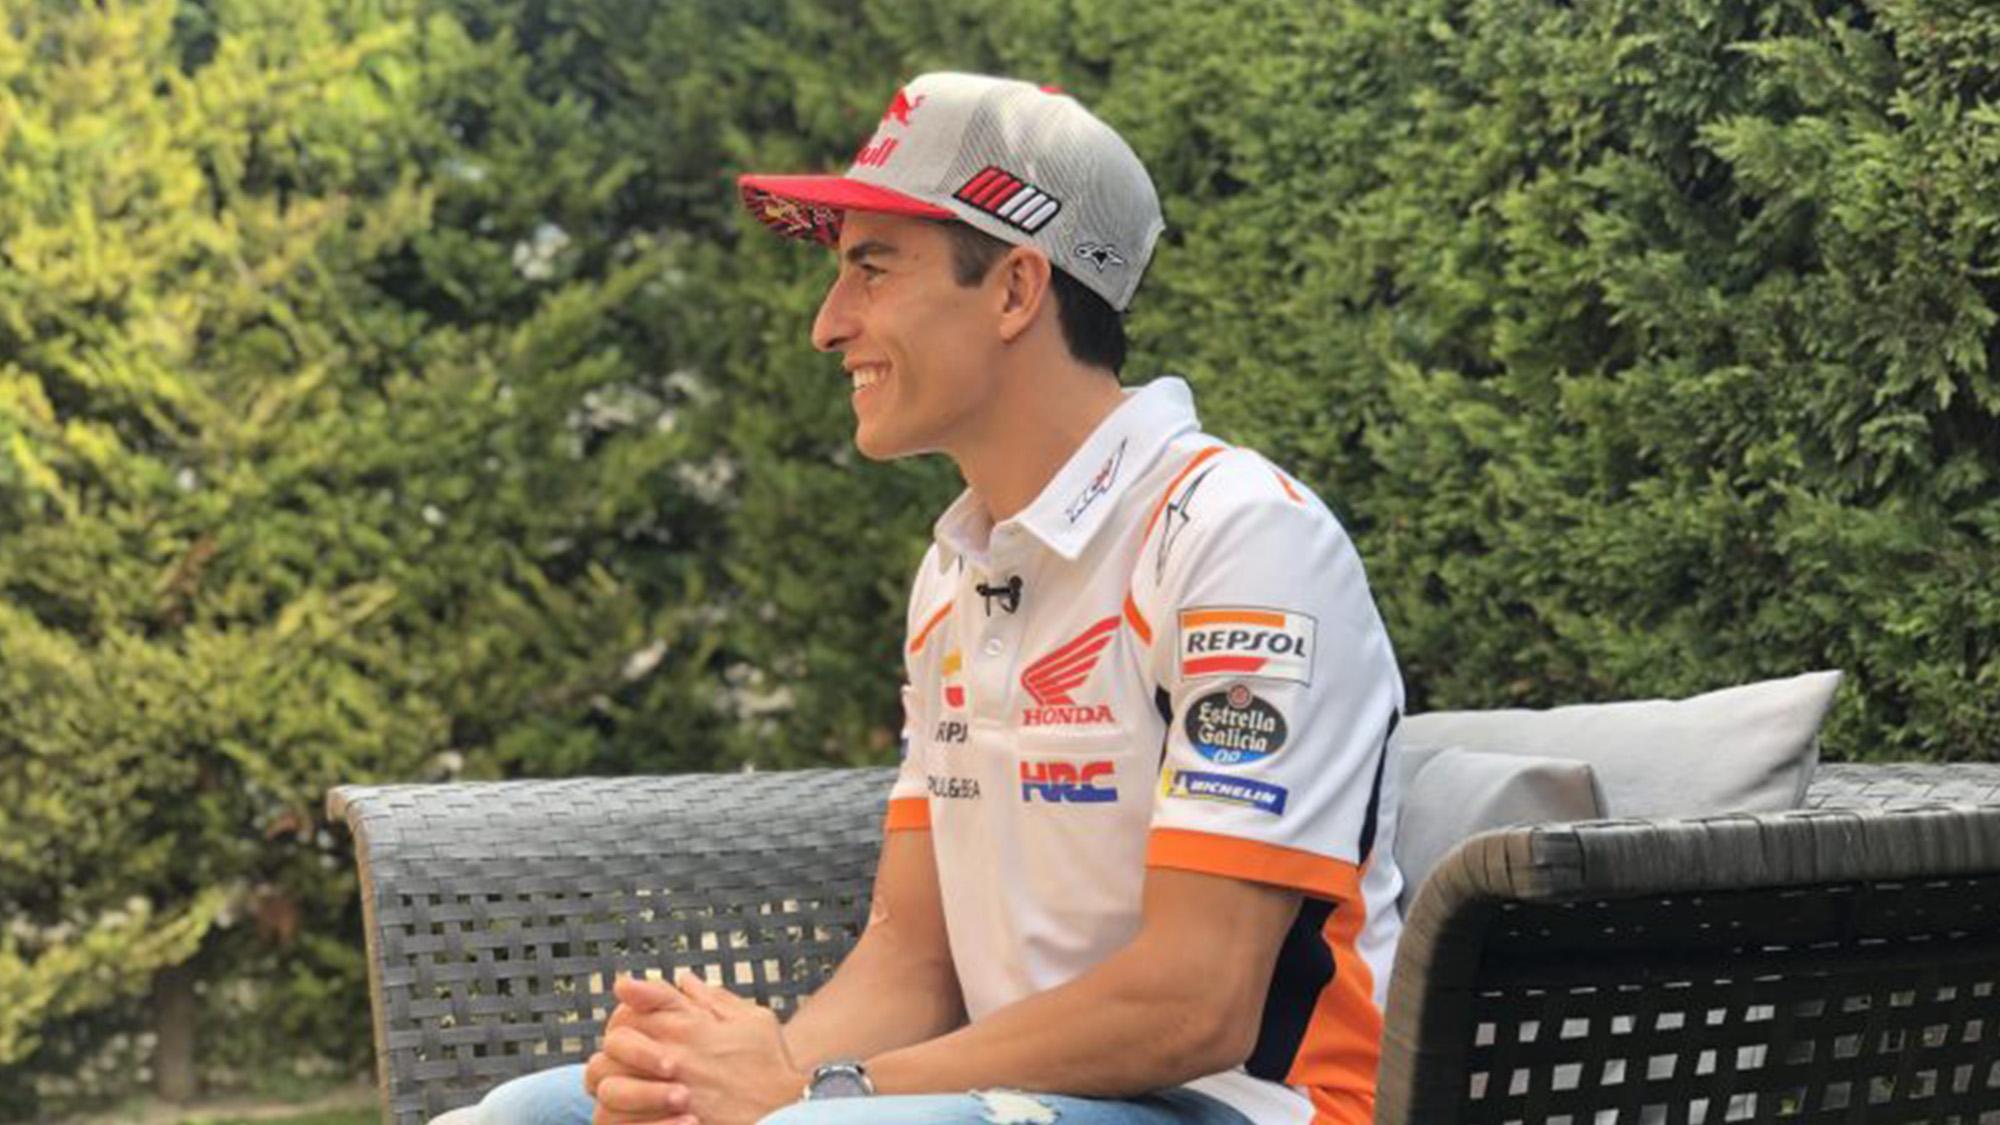 Marc Marquez September 2020 interview